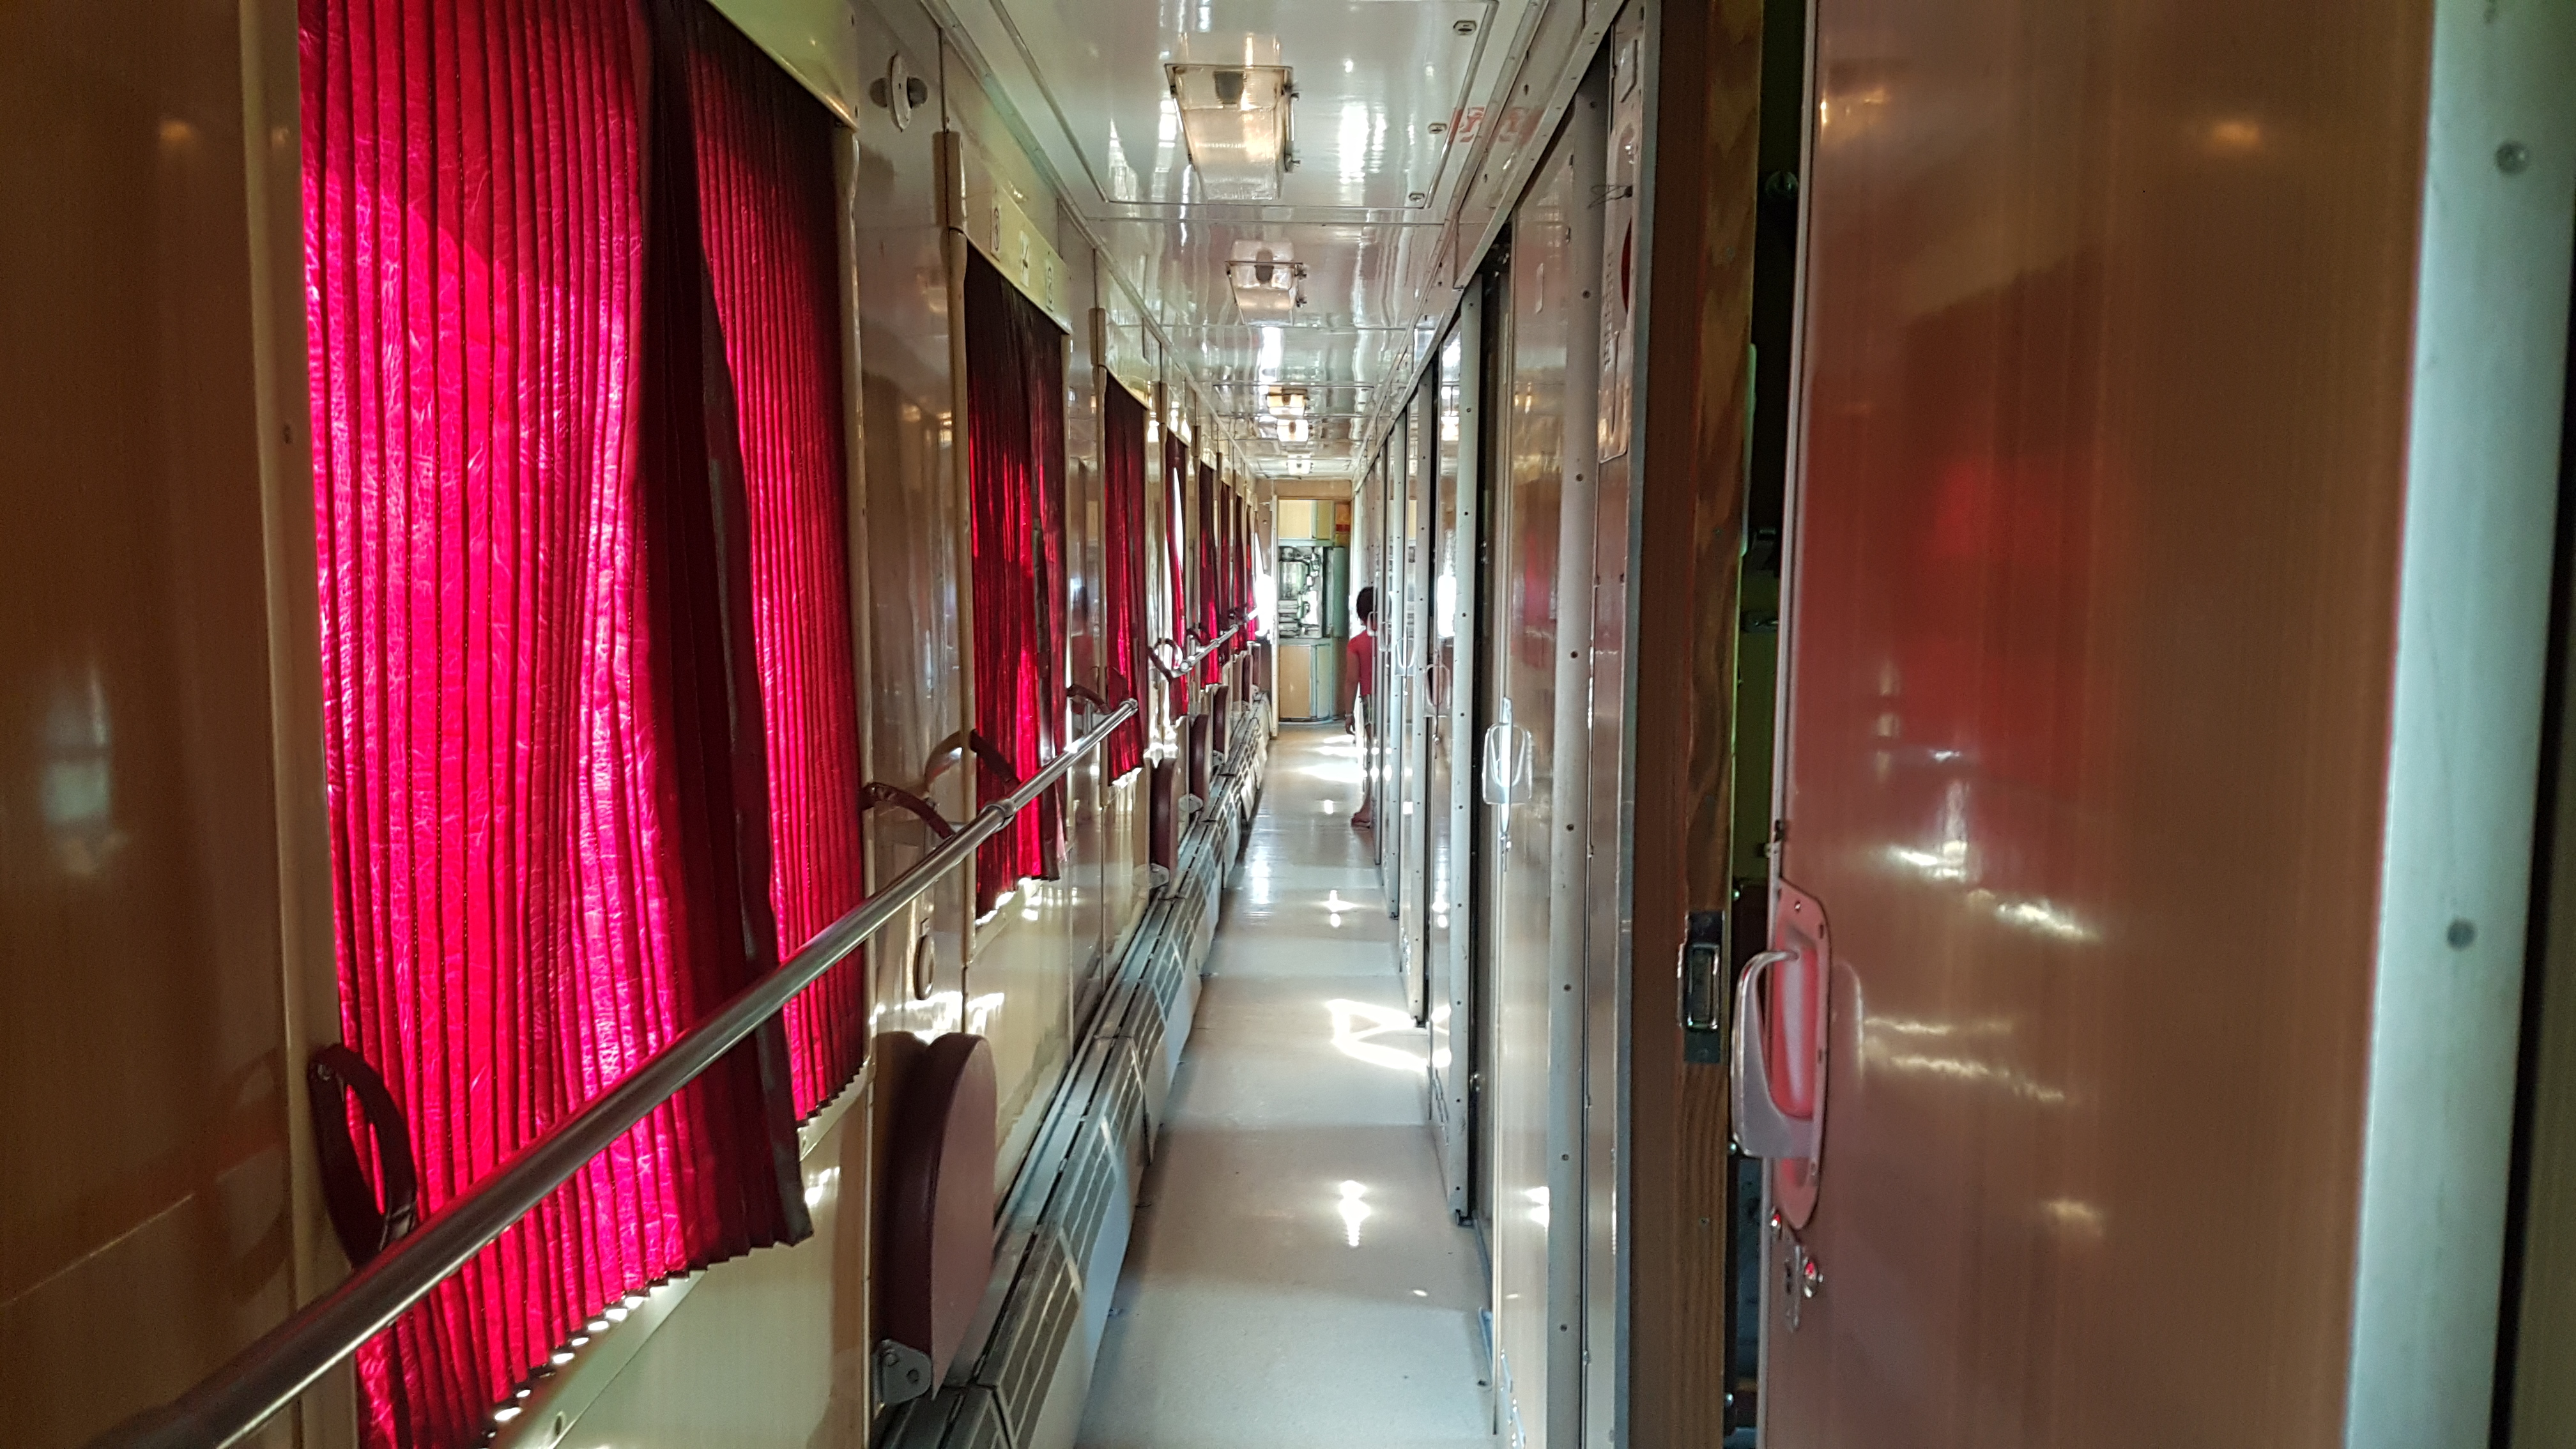 Sleeper Train Bunk Bed from Baku to Balakan Corridor | How to Get From Baku to Georgia